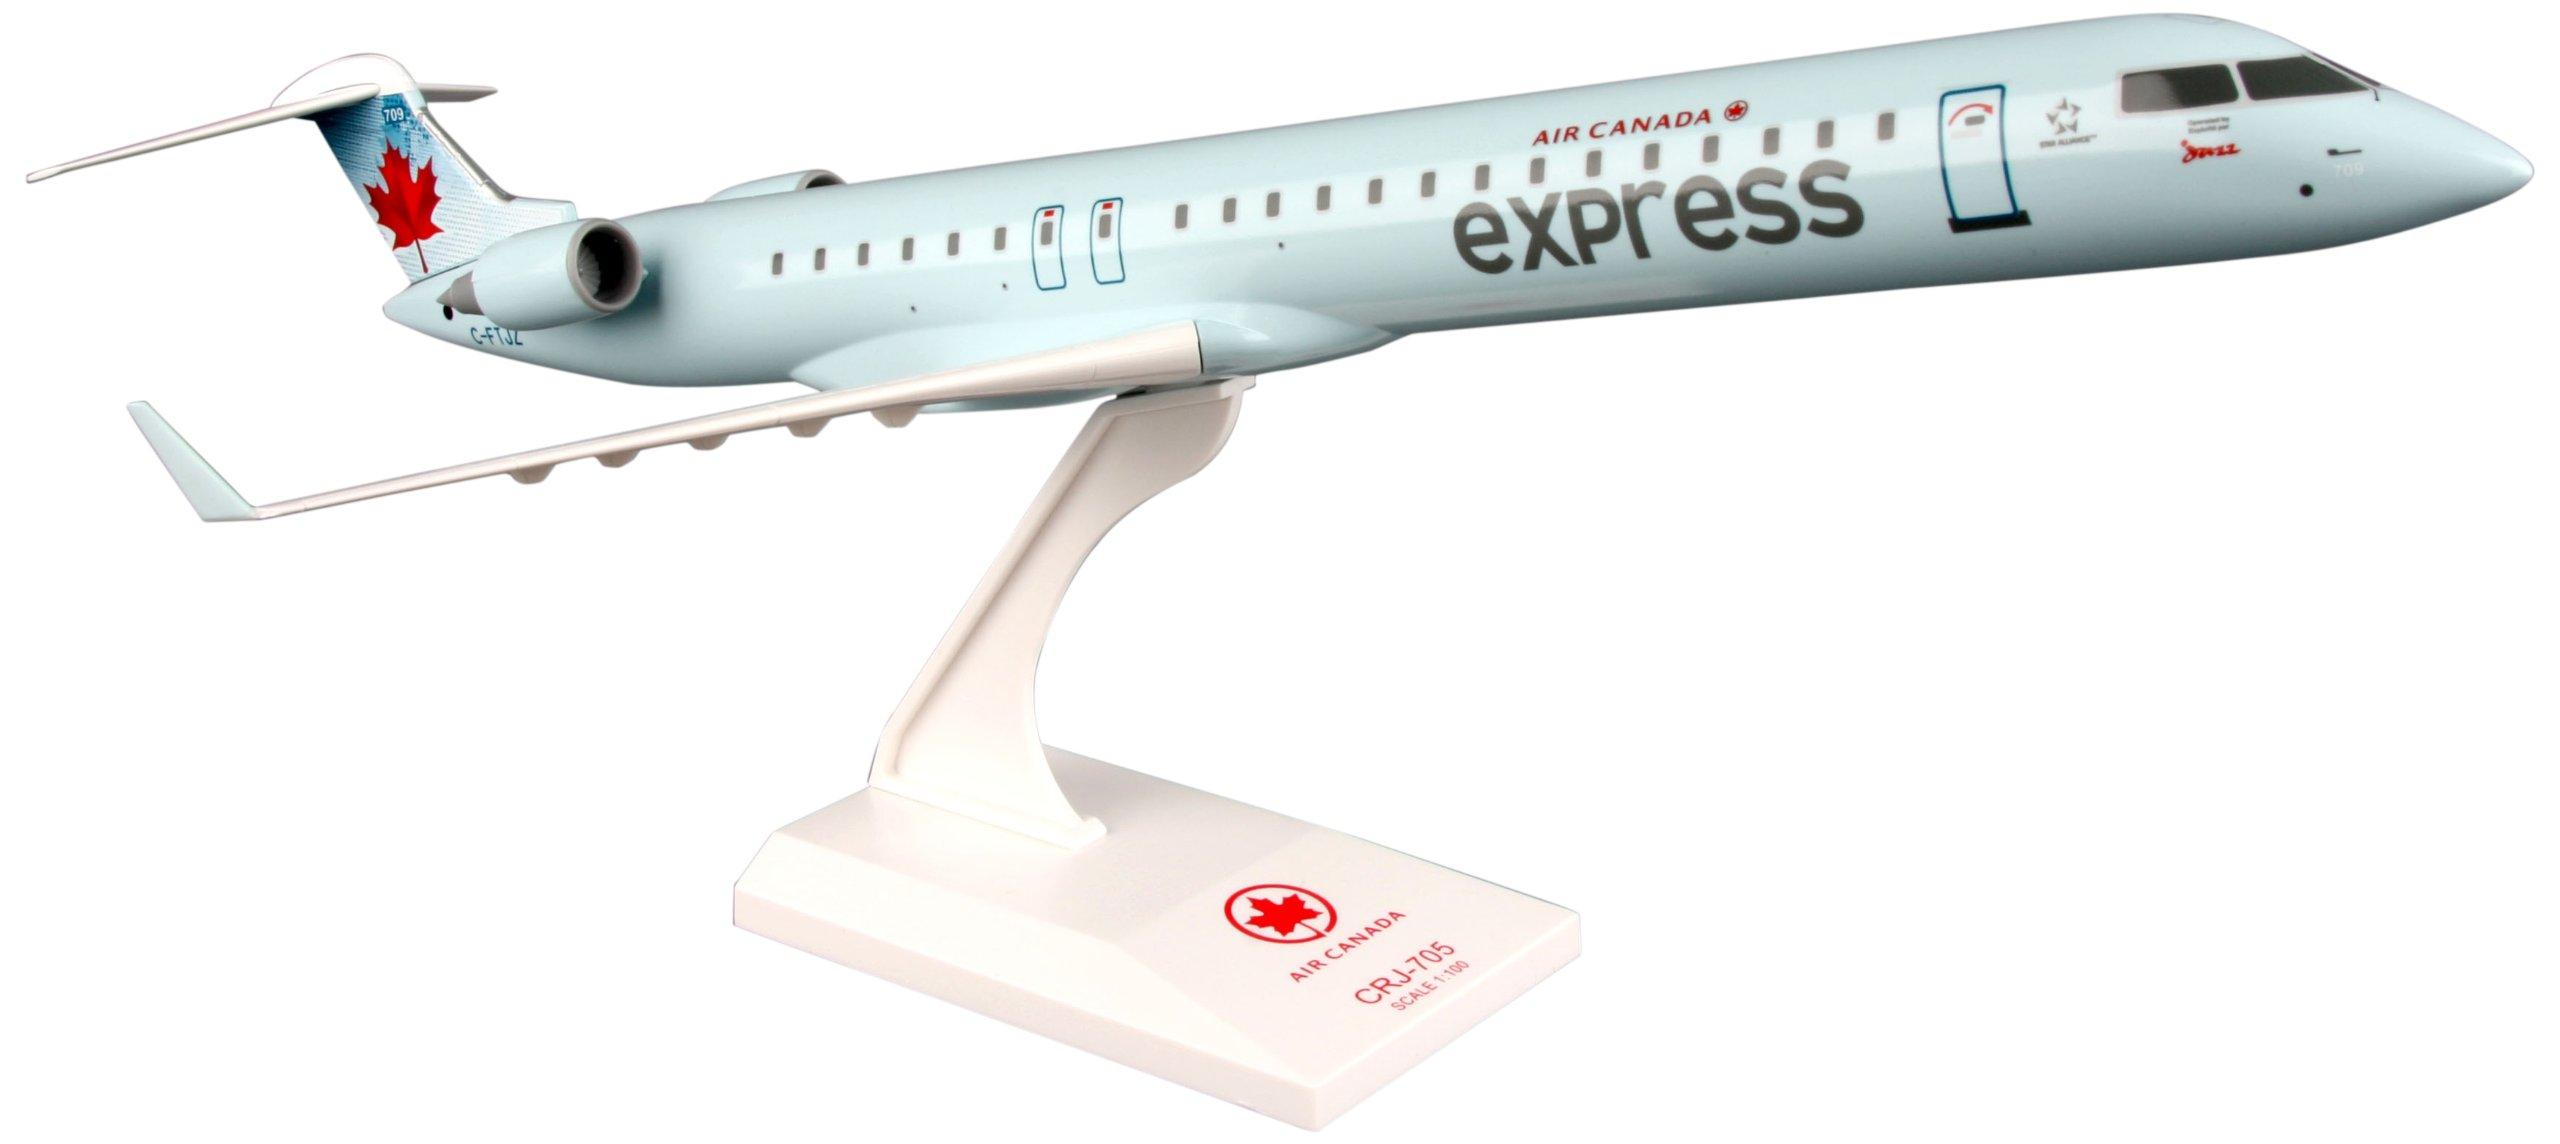 Daron Skymarks Air Canada Express CRJ705 Airplane Model Building Kit, 1/100-Scale by Daron (Image #1)